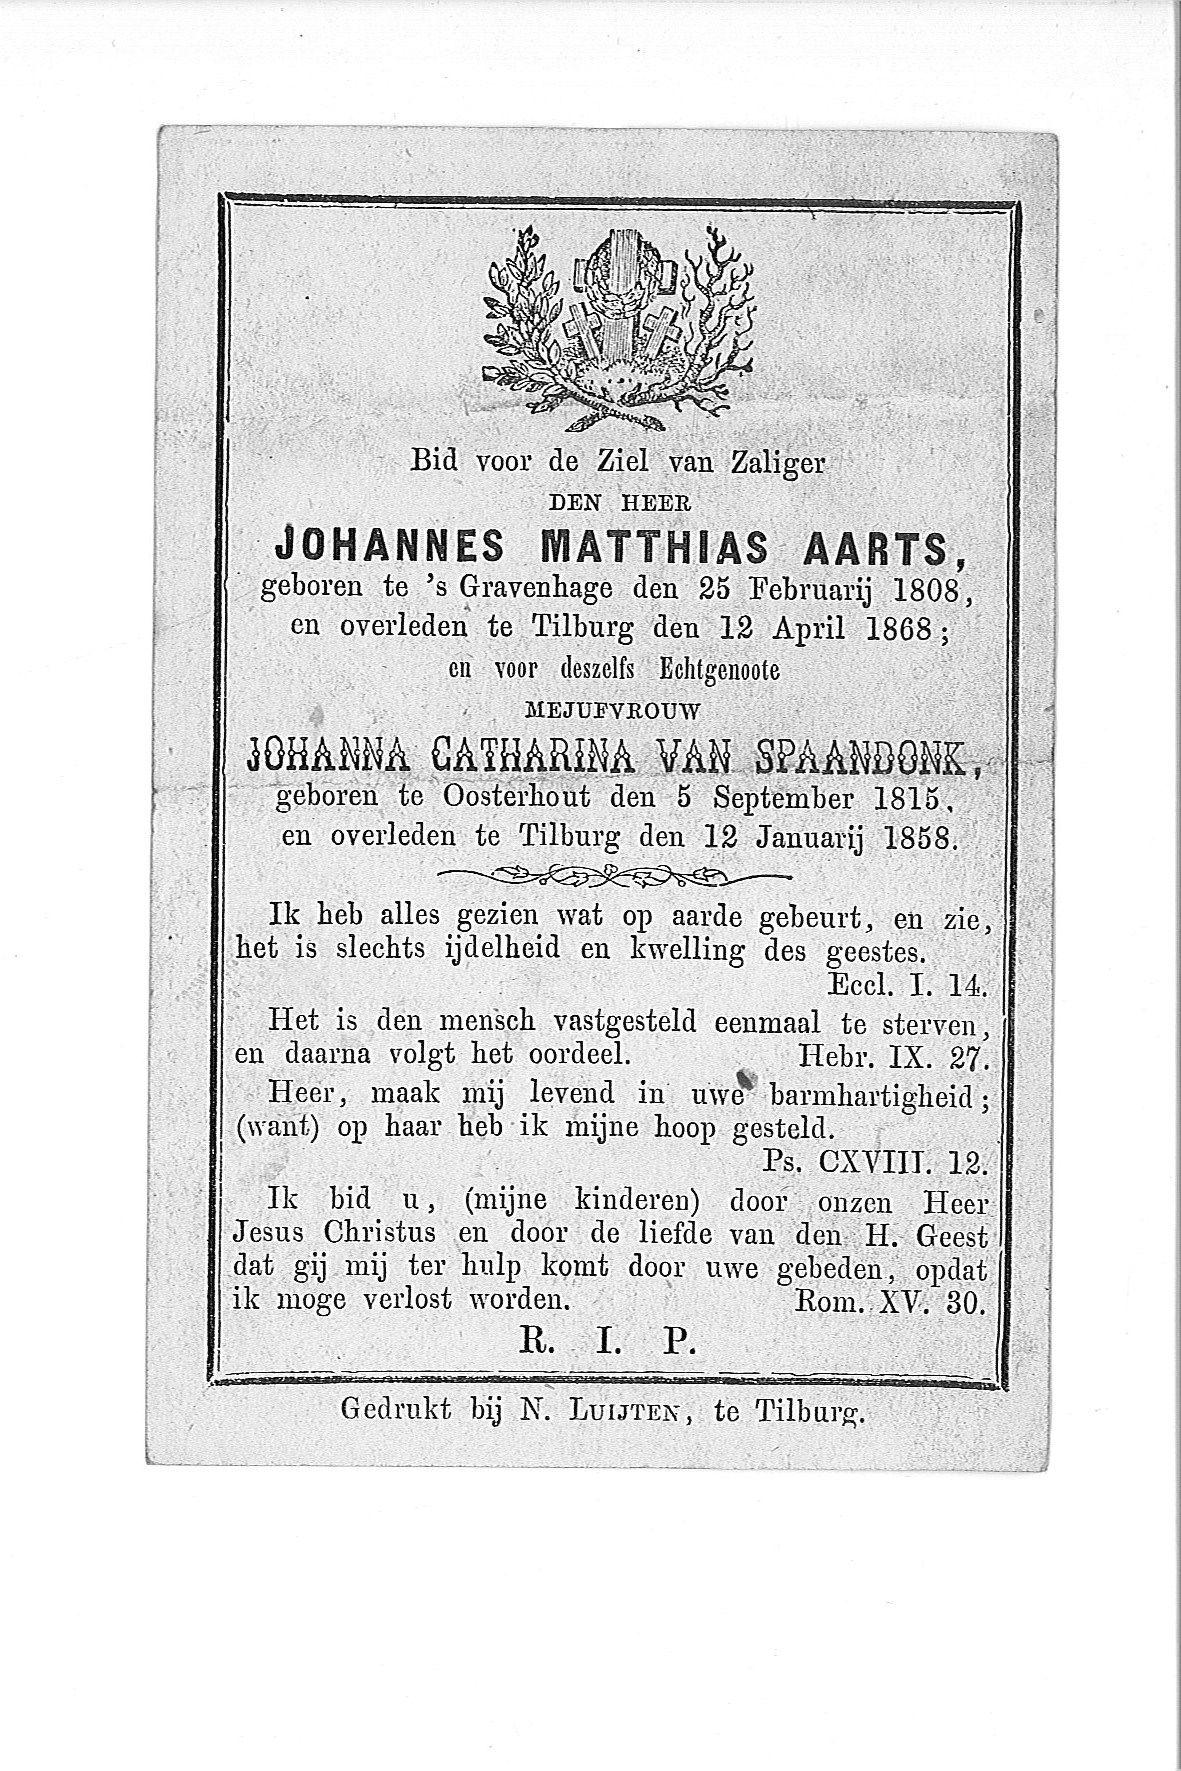 johannes-matthias(1868)20081128093120_00007.jpg